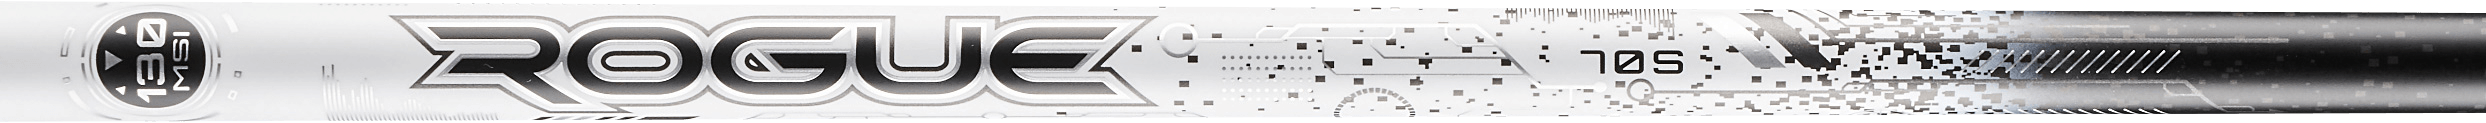 Alida Rogue White 130 MSI